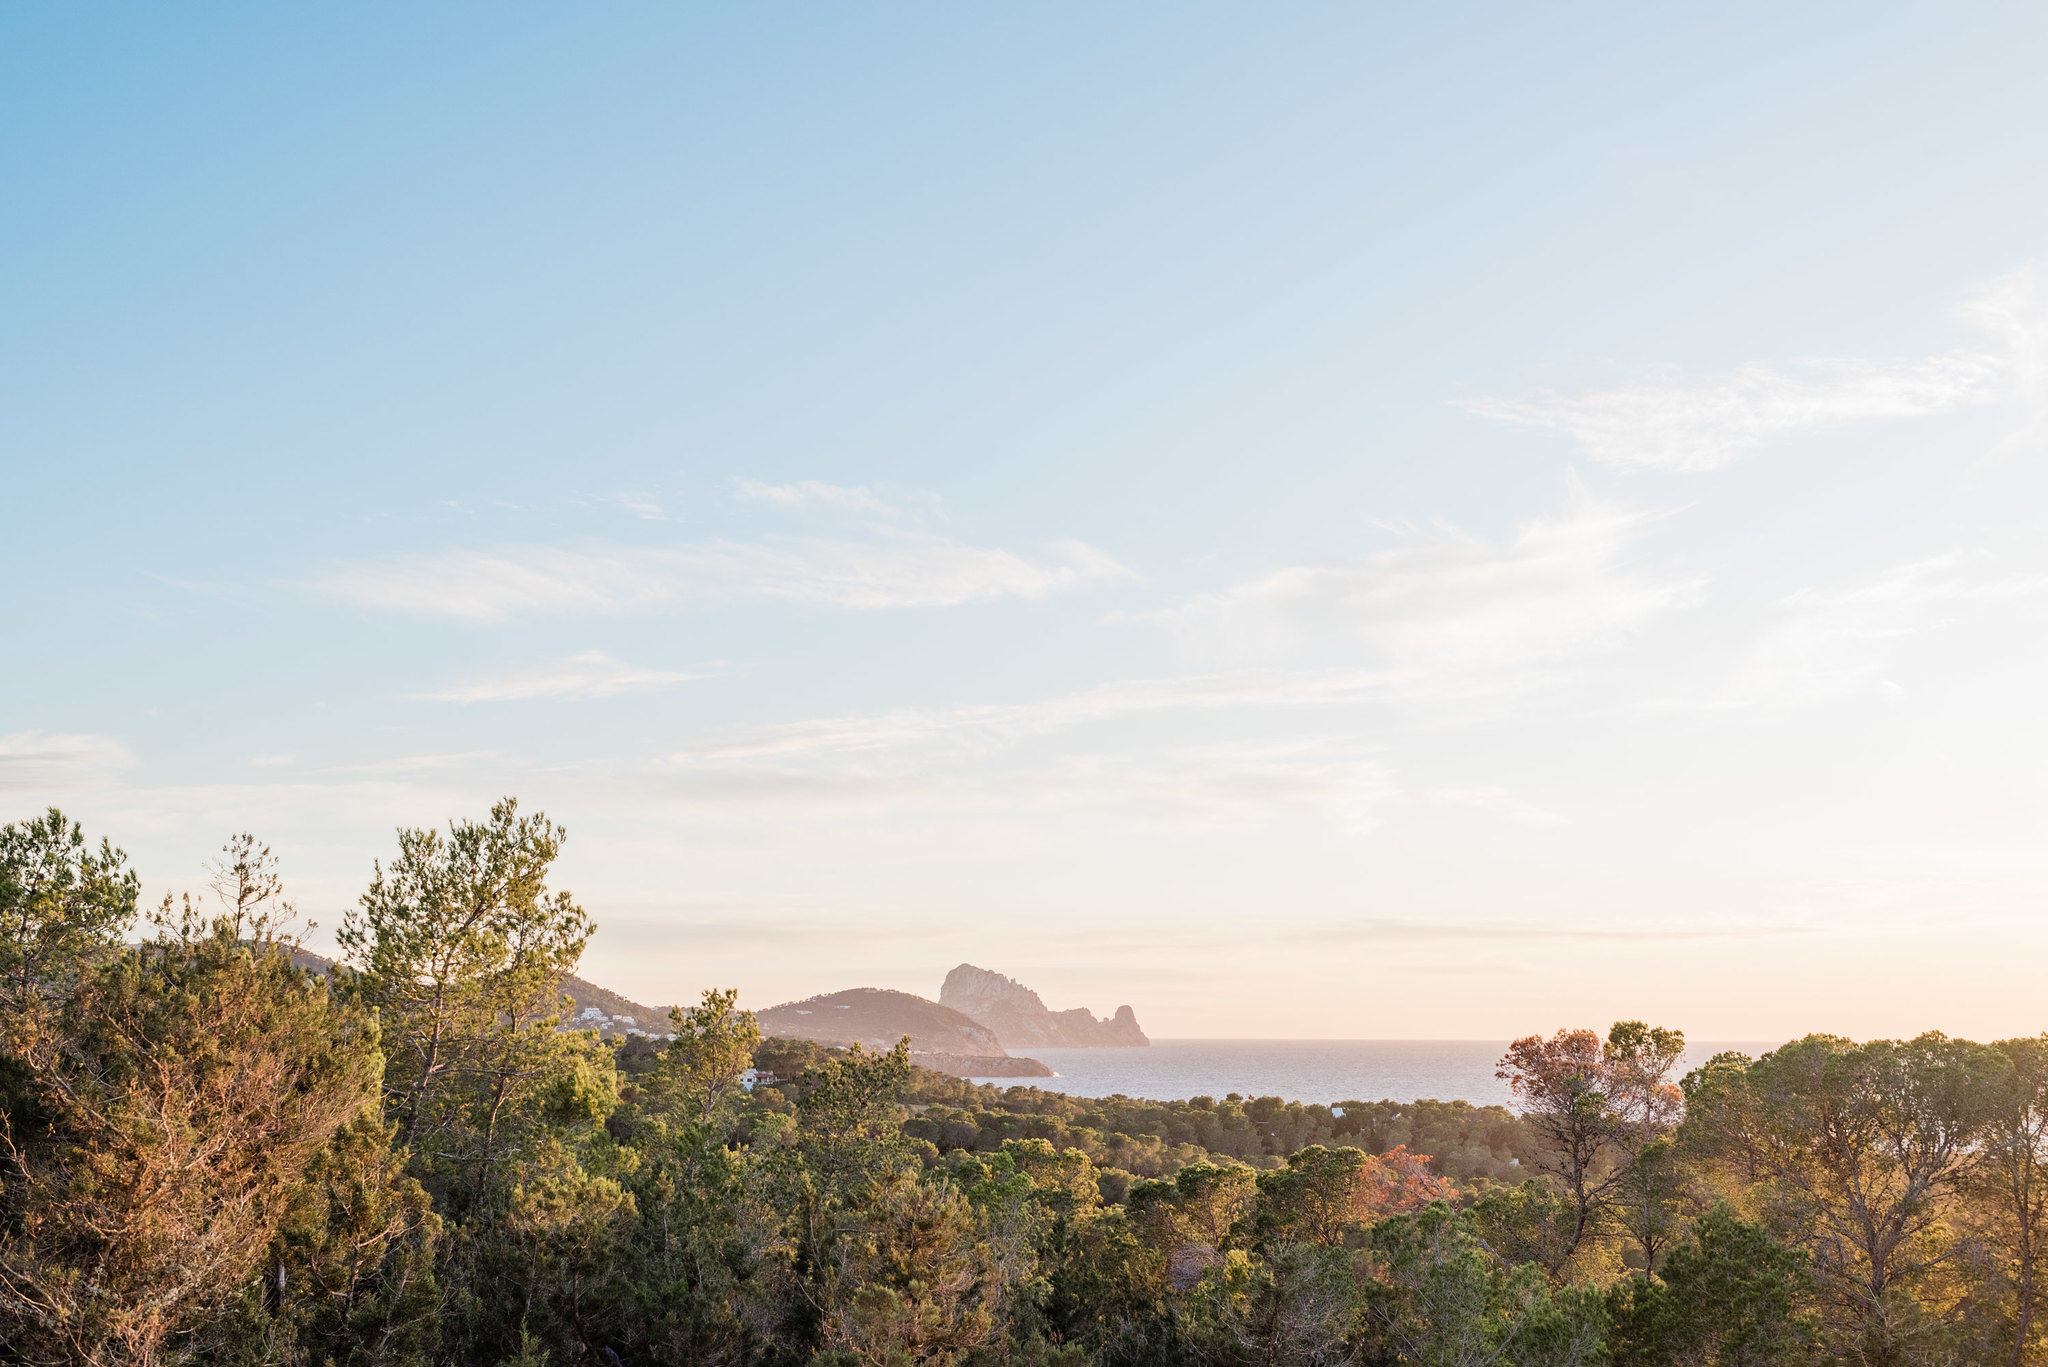 https://www.white-ibiza.com/wp-content/uploads/2020/06/white-ibiza-villas-sa-serra-exterior-seaview.jpg